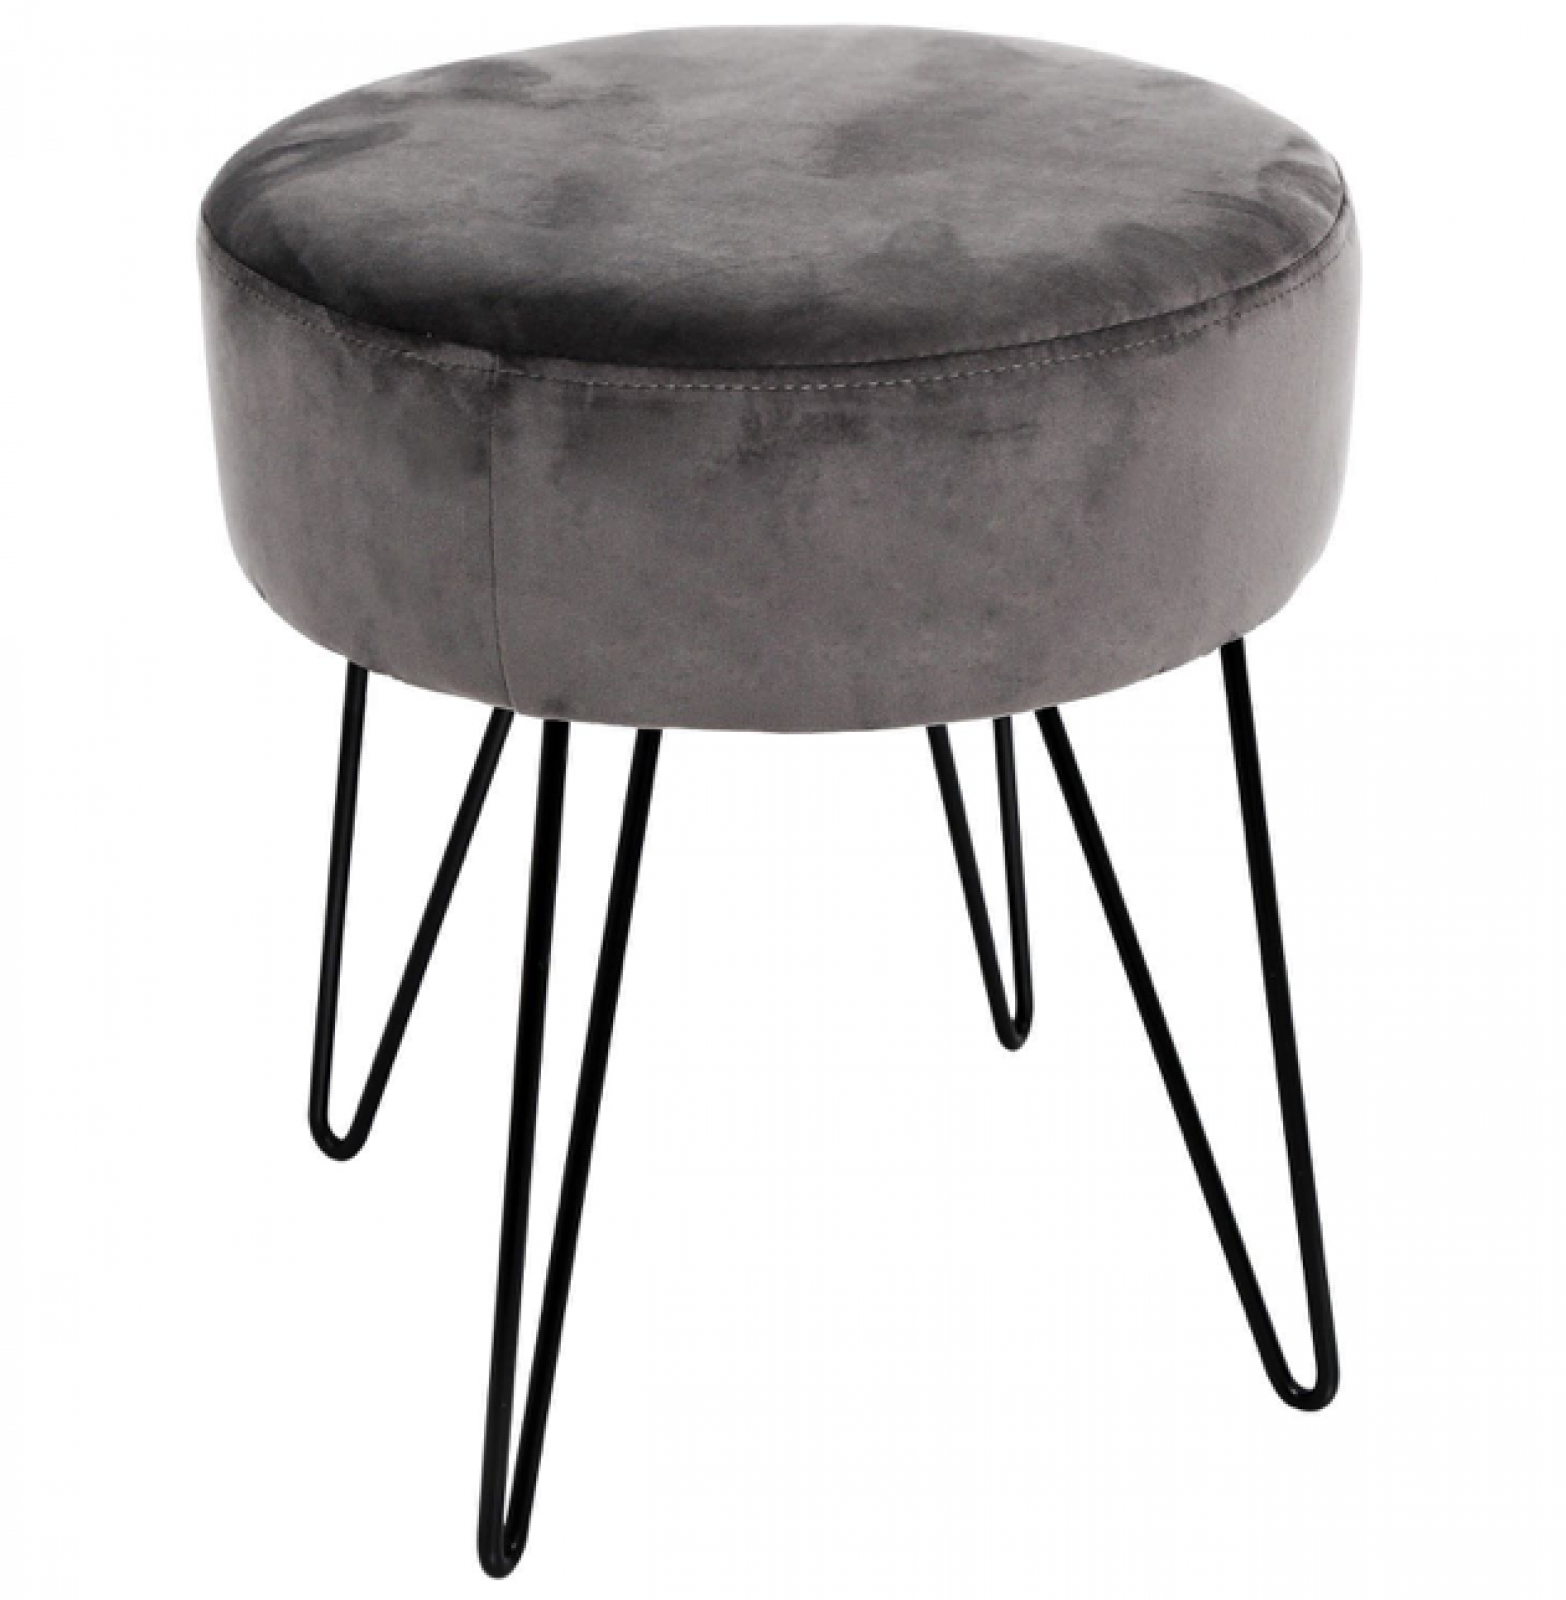 Grey Velvet Circular Stool With Black Hairpin Legs